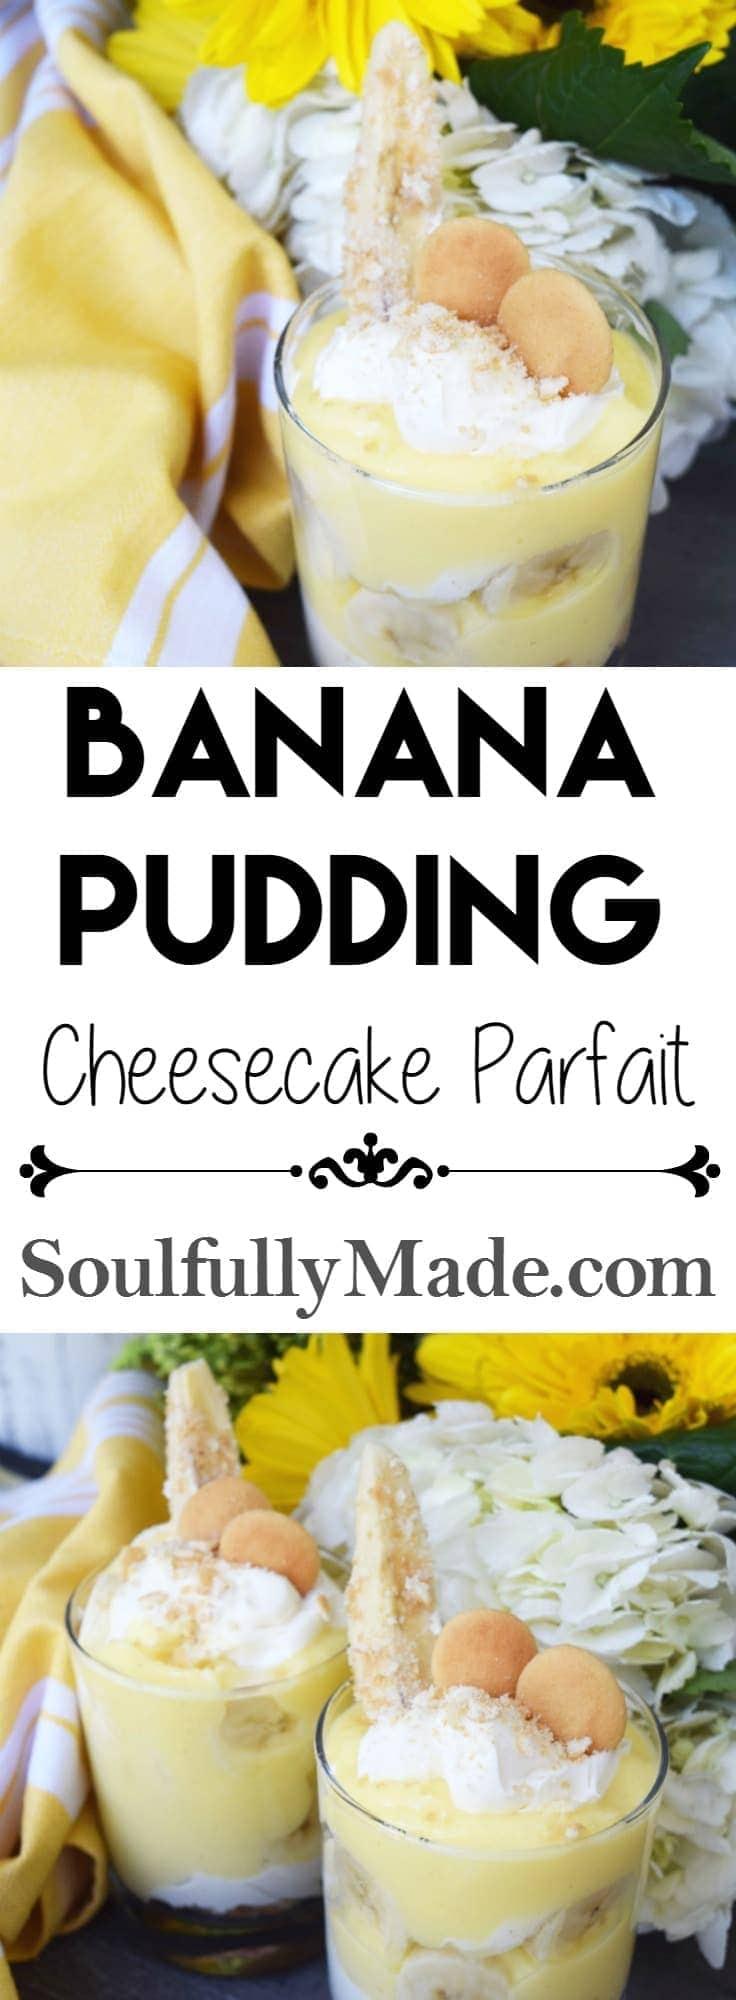 Banana Pudding Cheesecake Parfait Pin